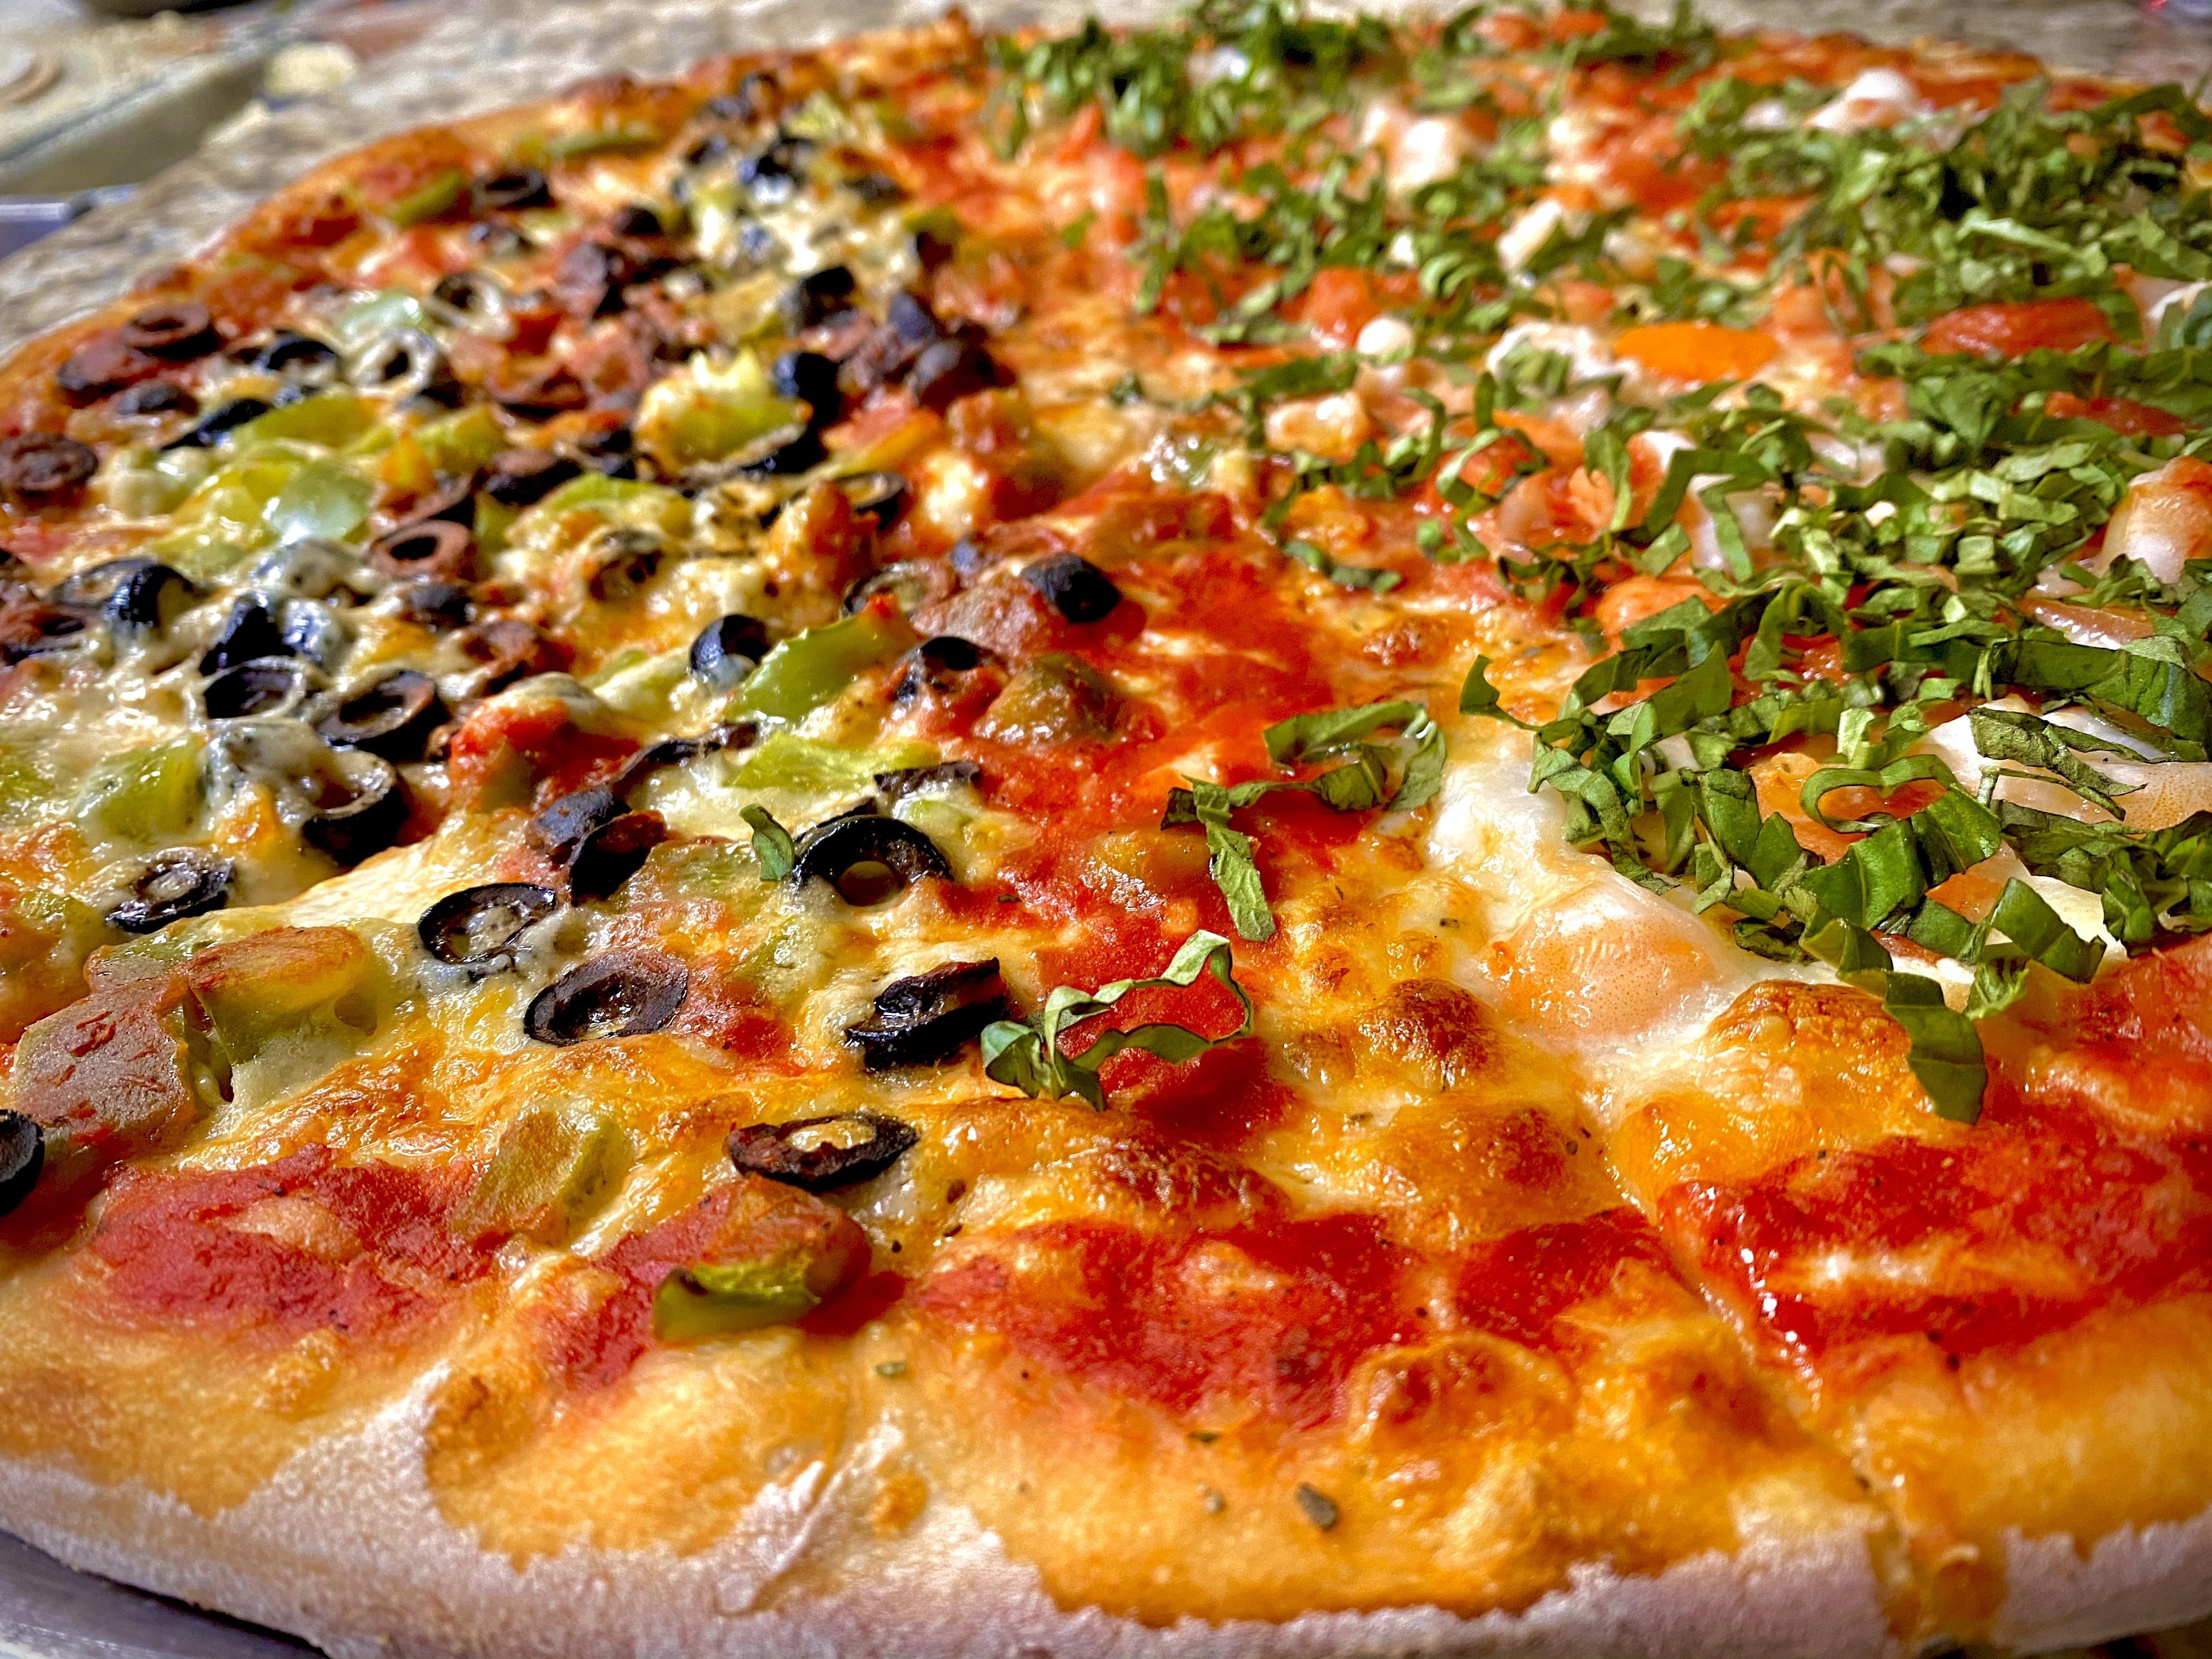 nj pizza woodbridge nj Strawberrys pub